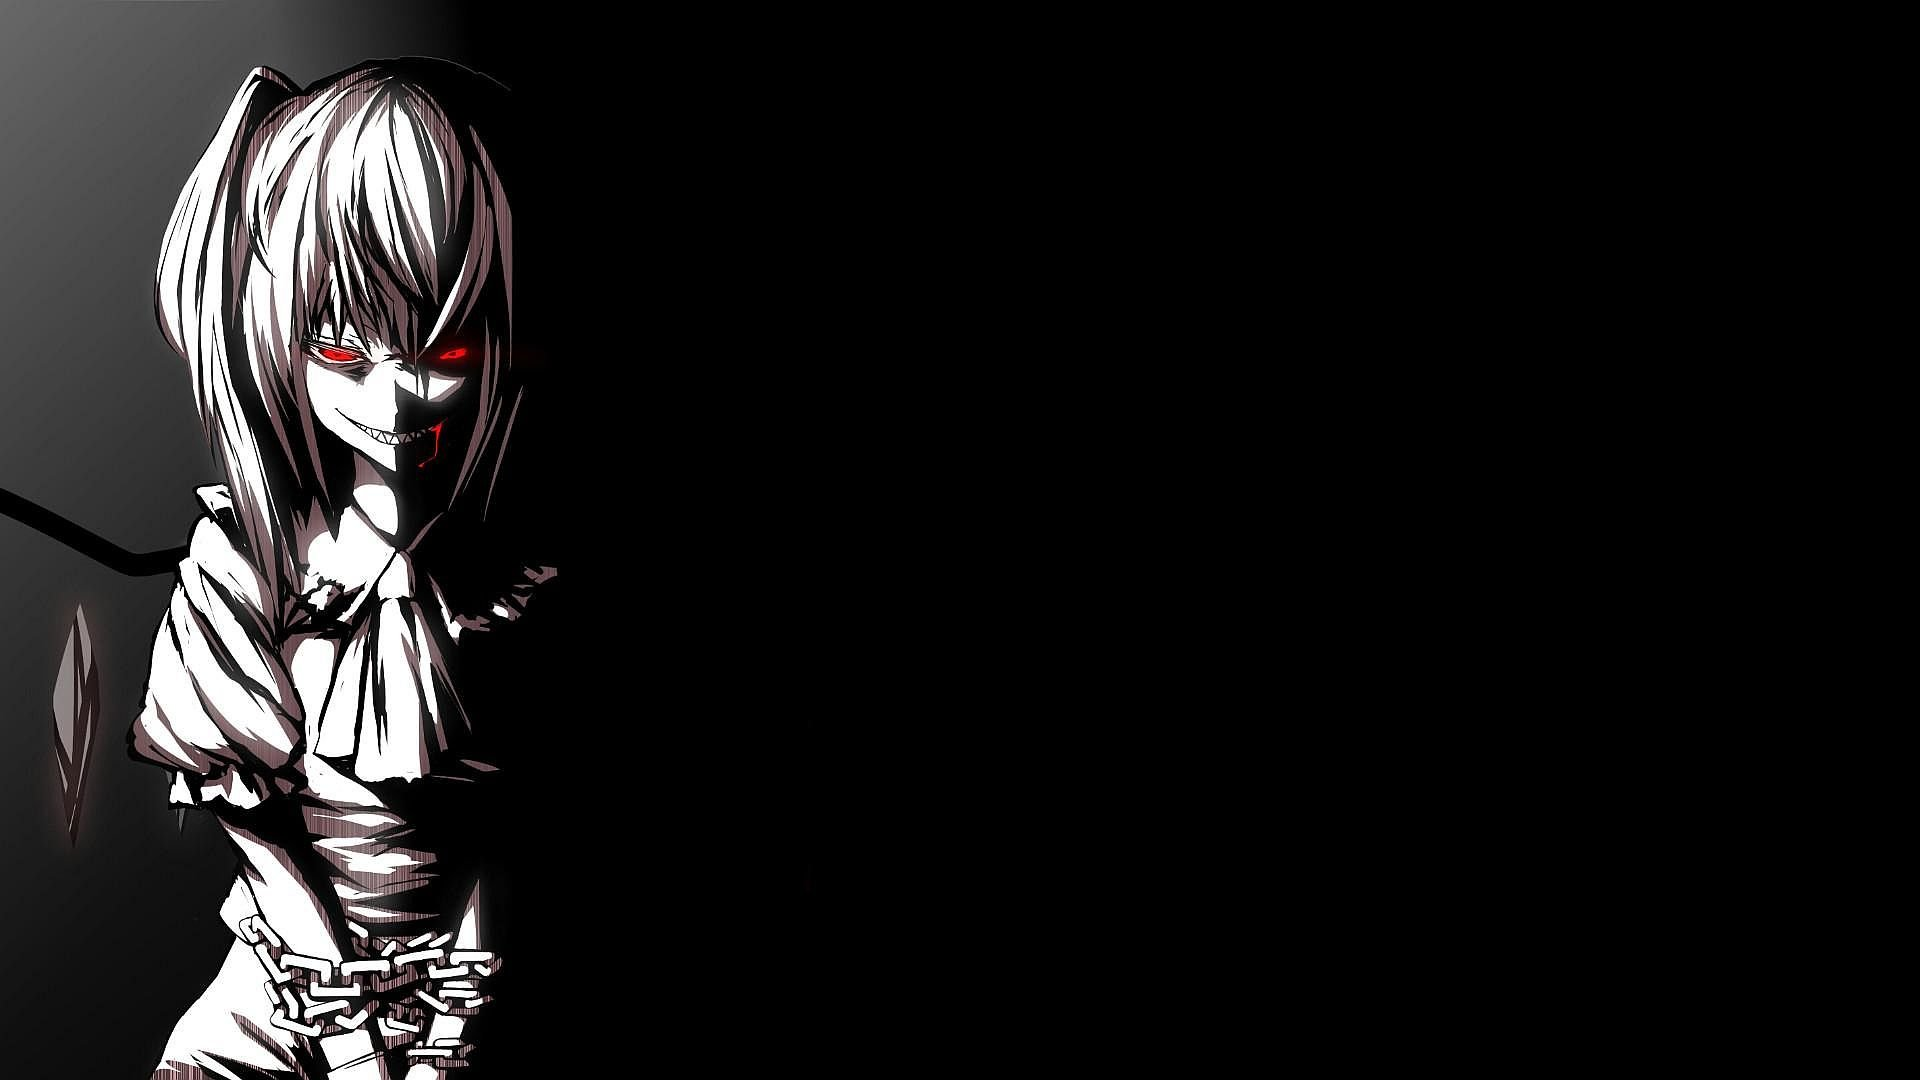 Black anime wallpaper HD